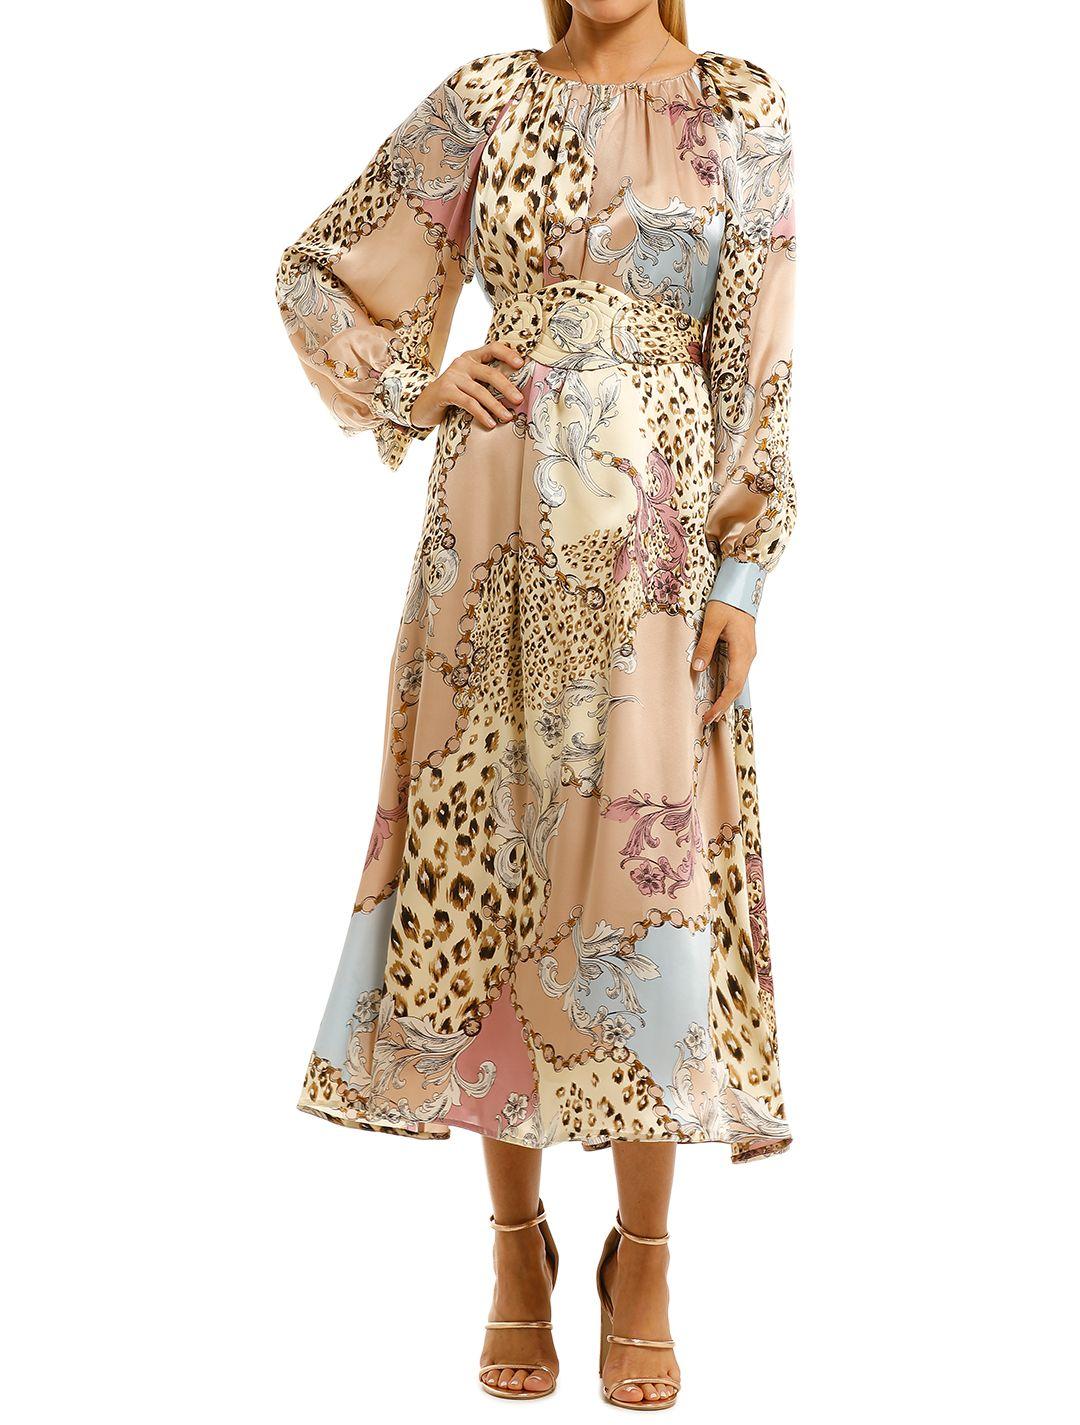 Scanlan-Theodore-Silk-Animal-Chain-Print-Dress-Front